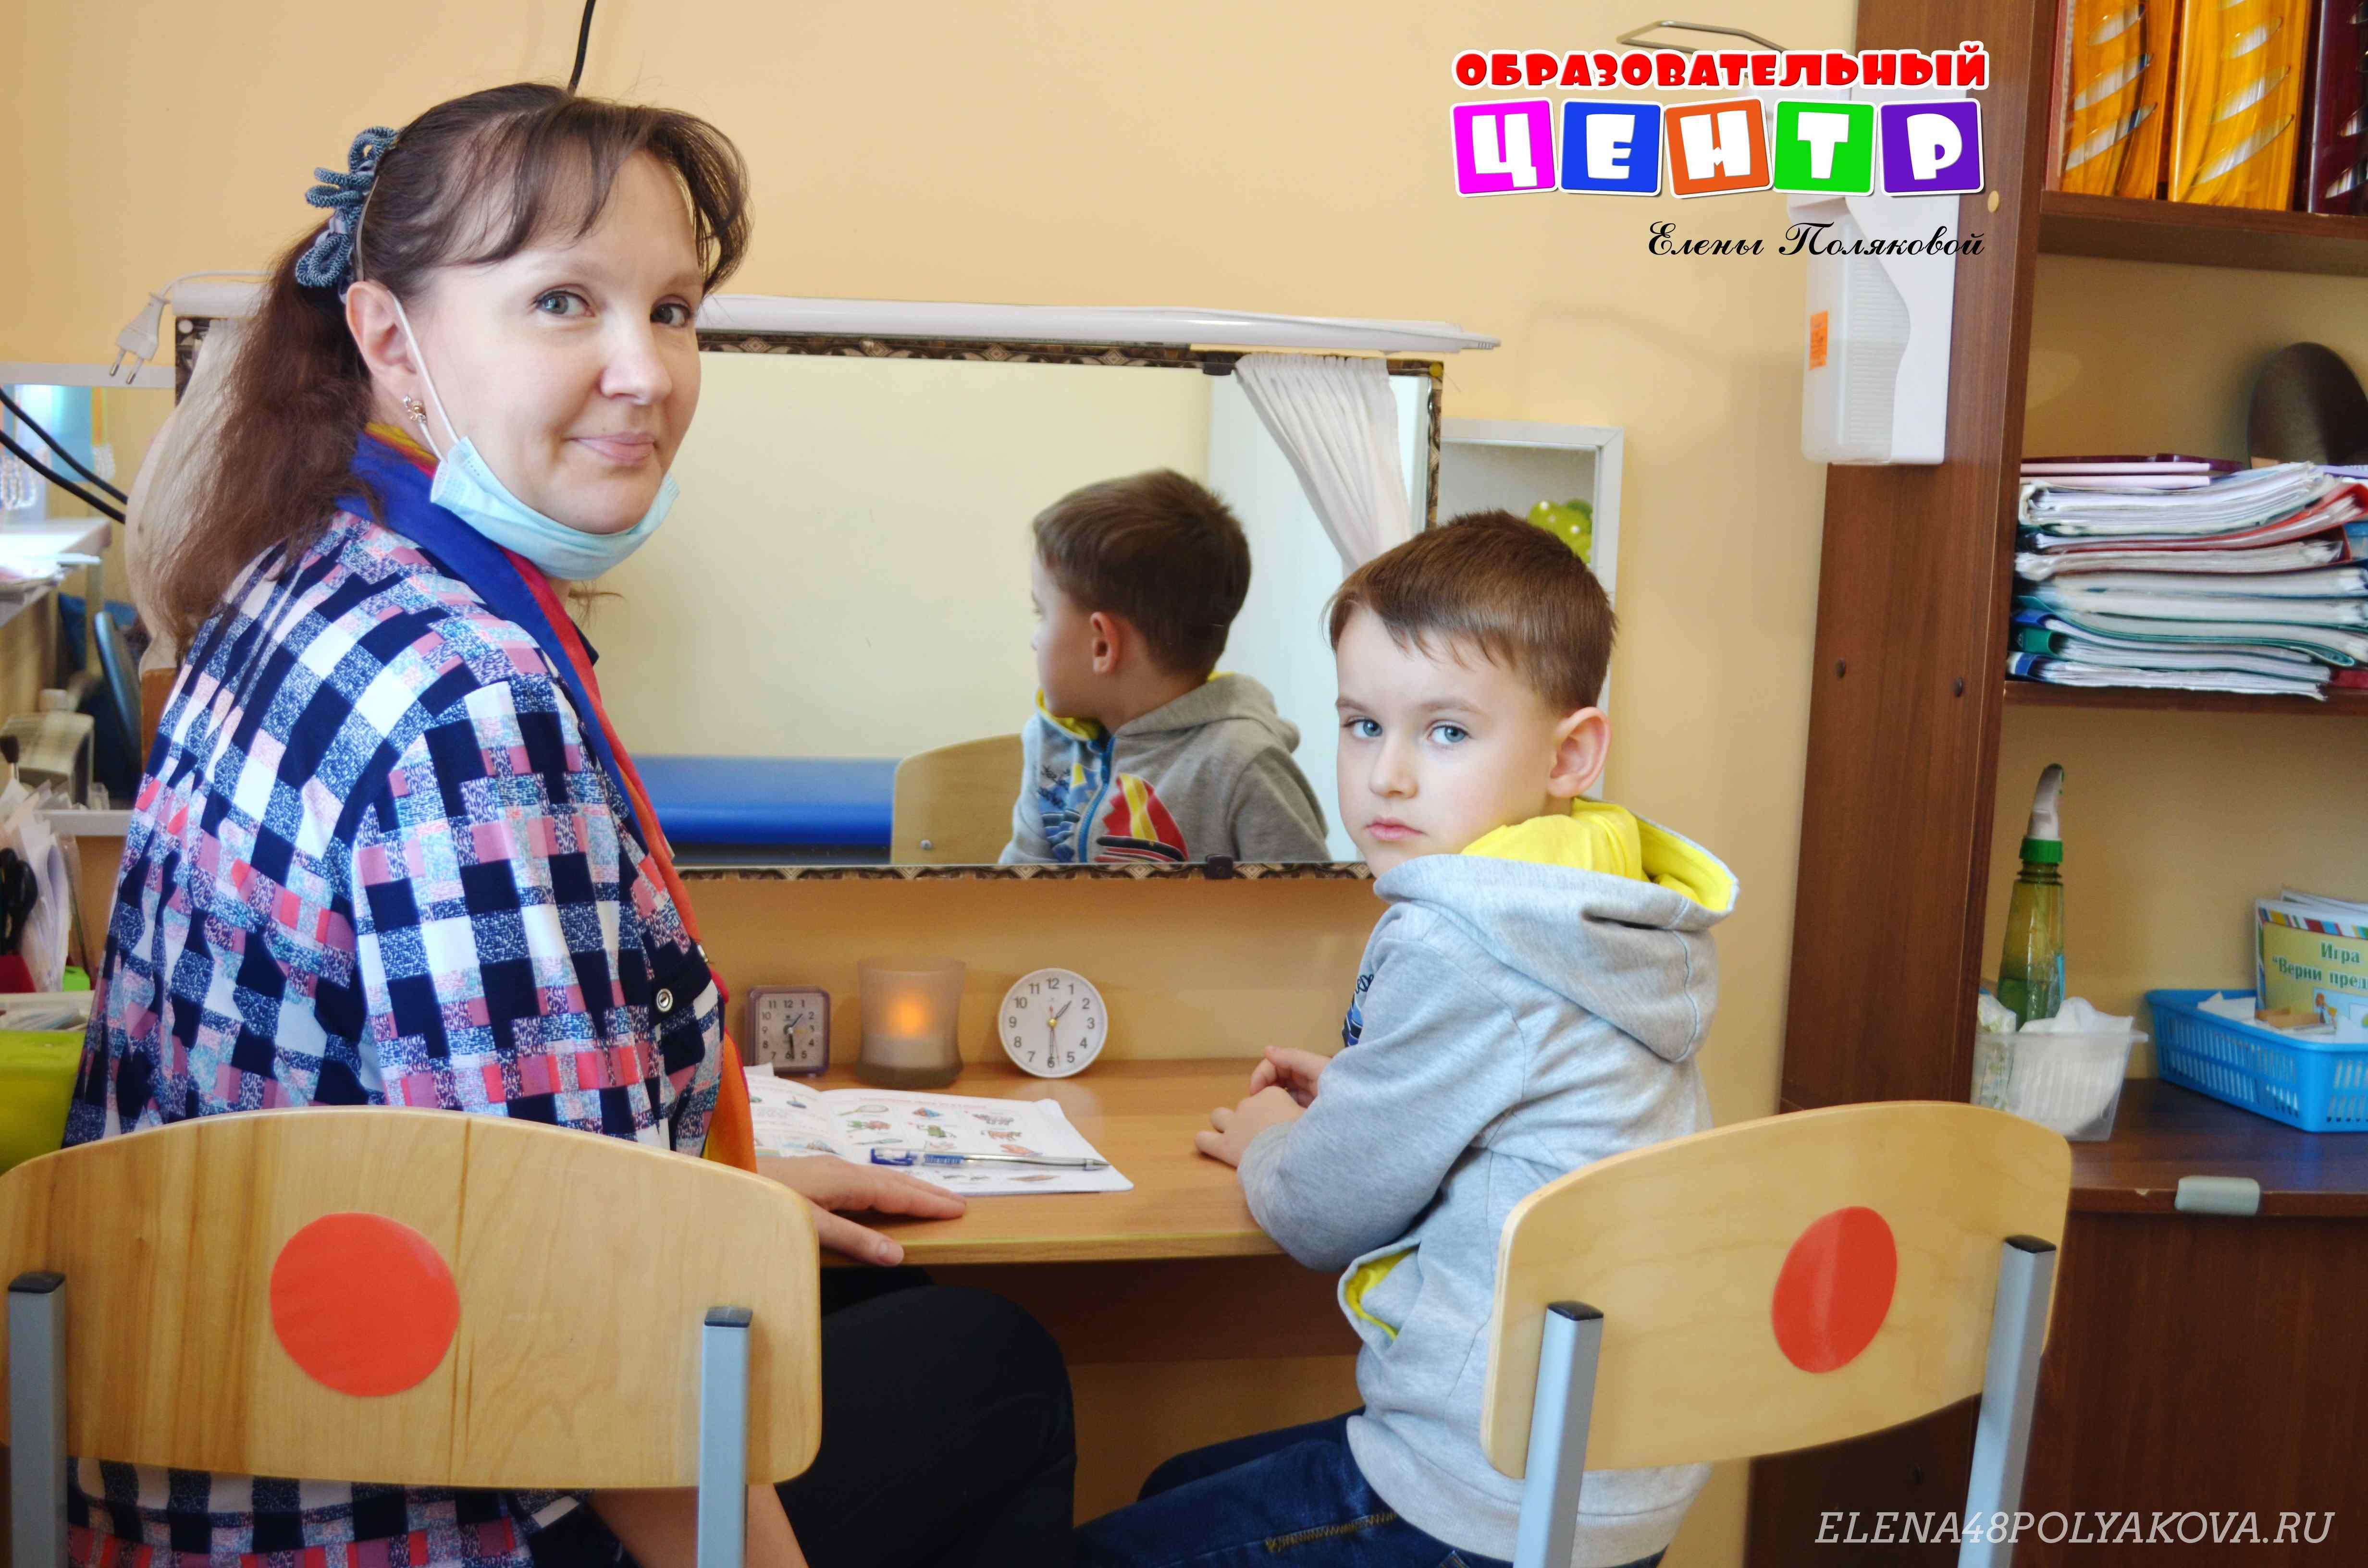 Саша Ткаченко из Москвы